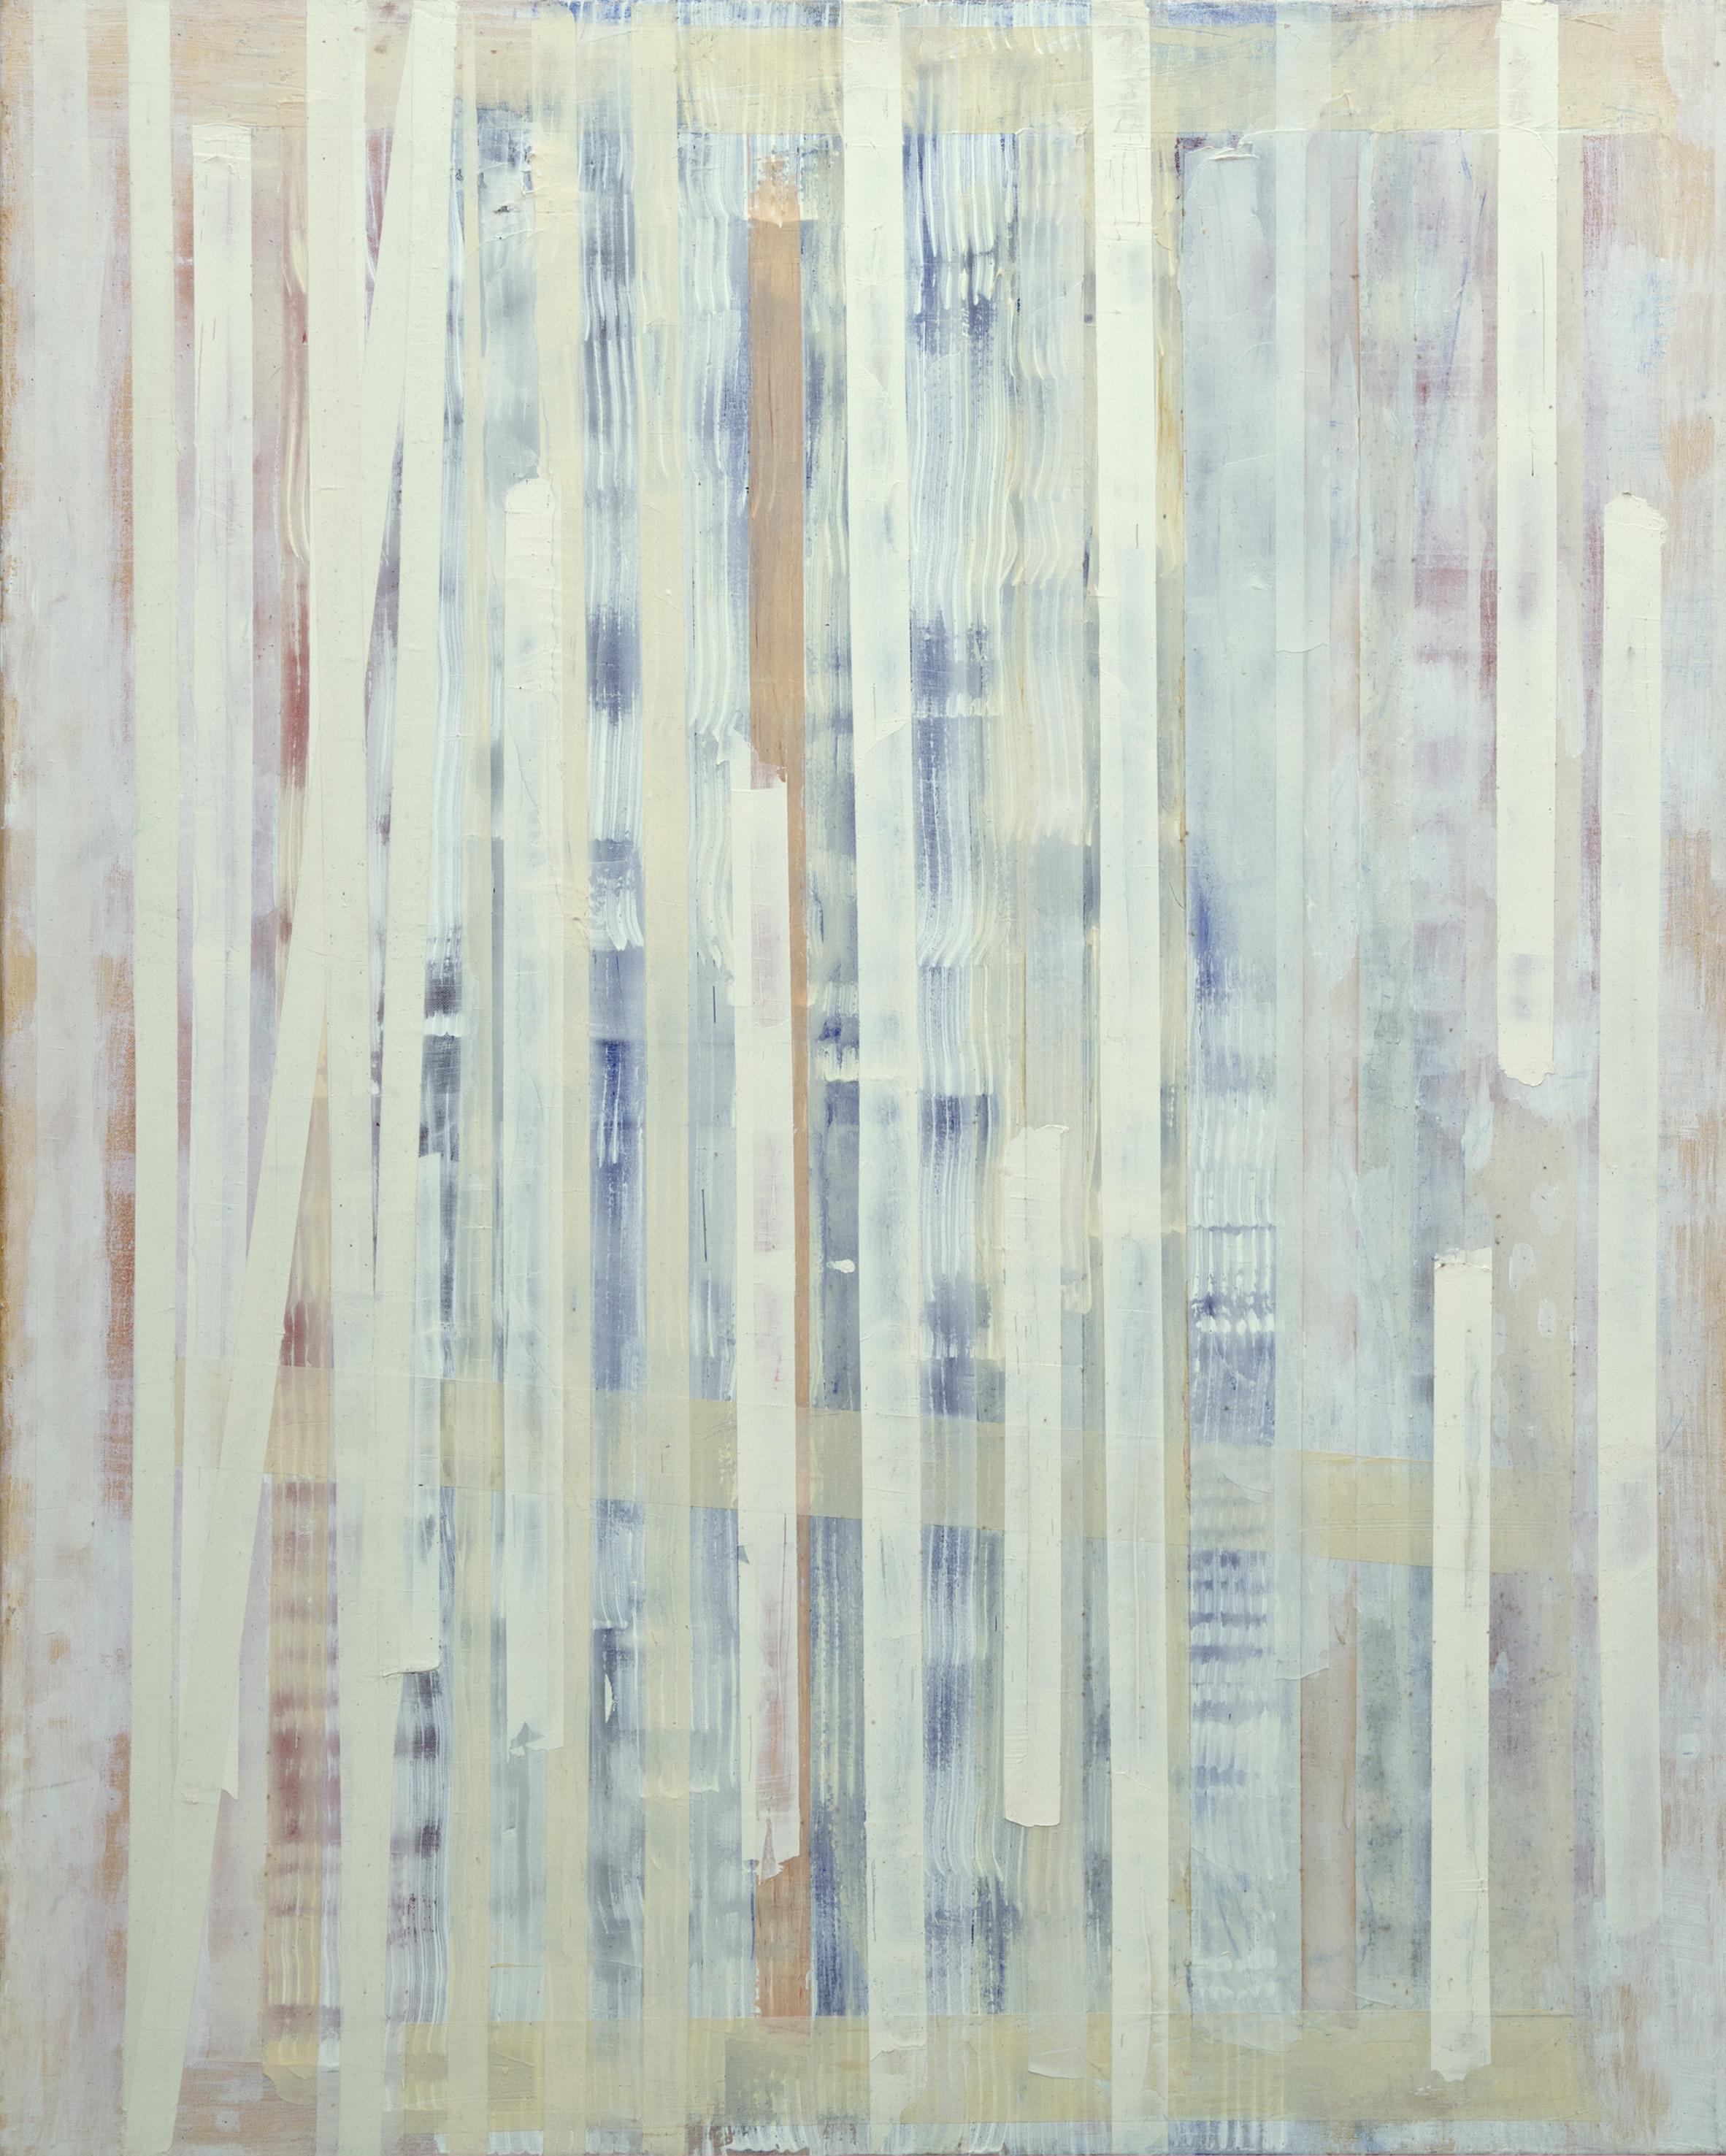 1 Herbert Egger –TRANSIT-2012-80 x 100 cm-acrylic on canvas.jpg